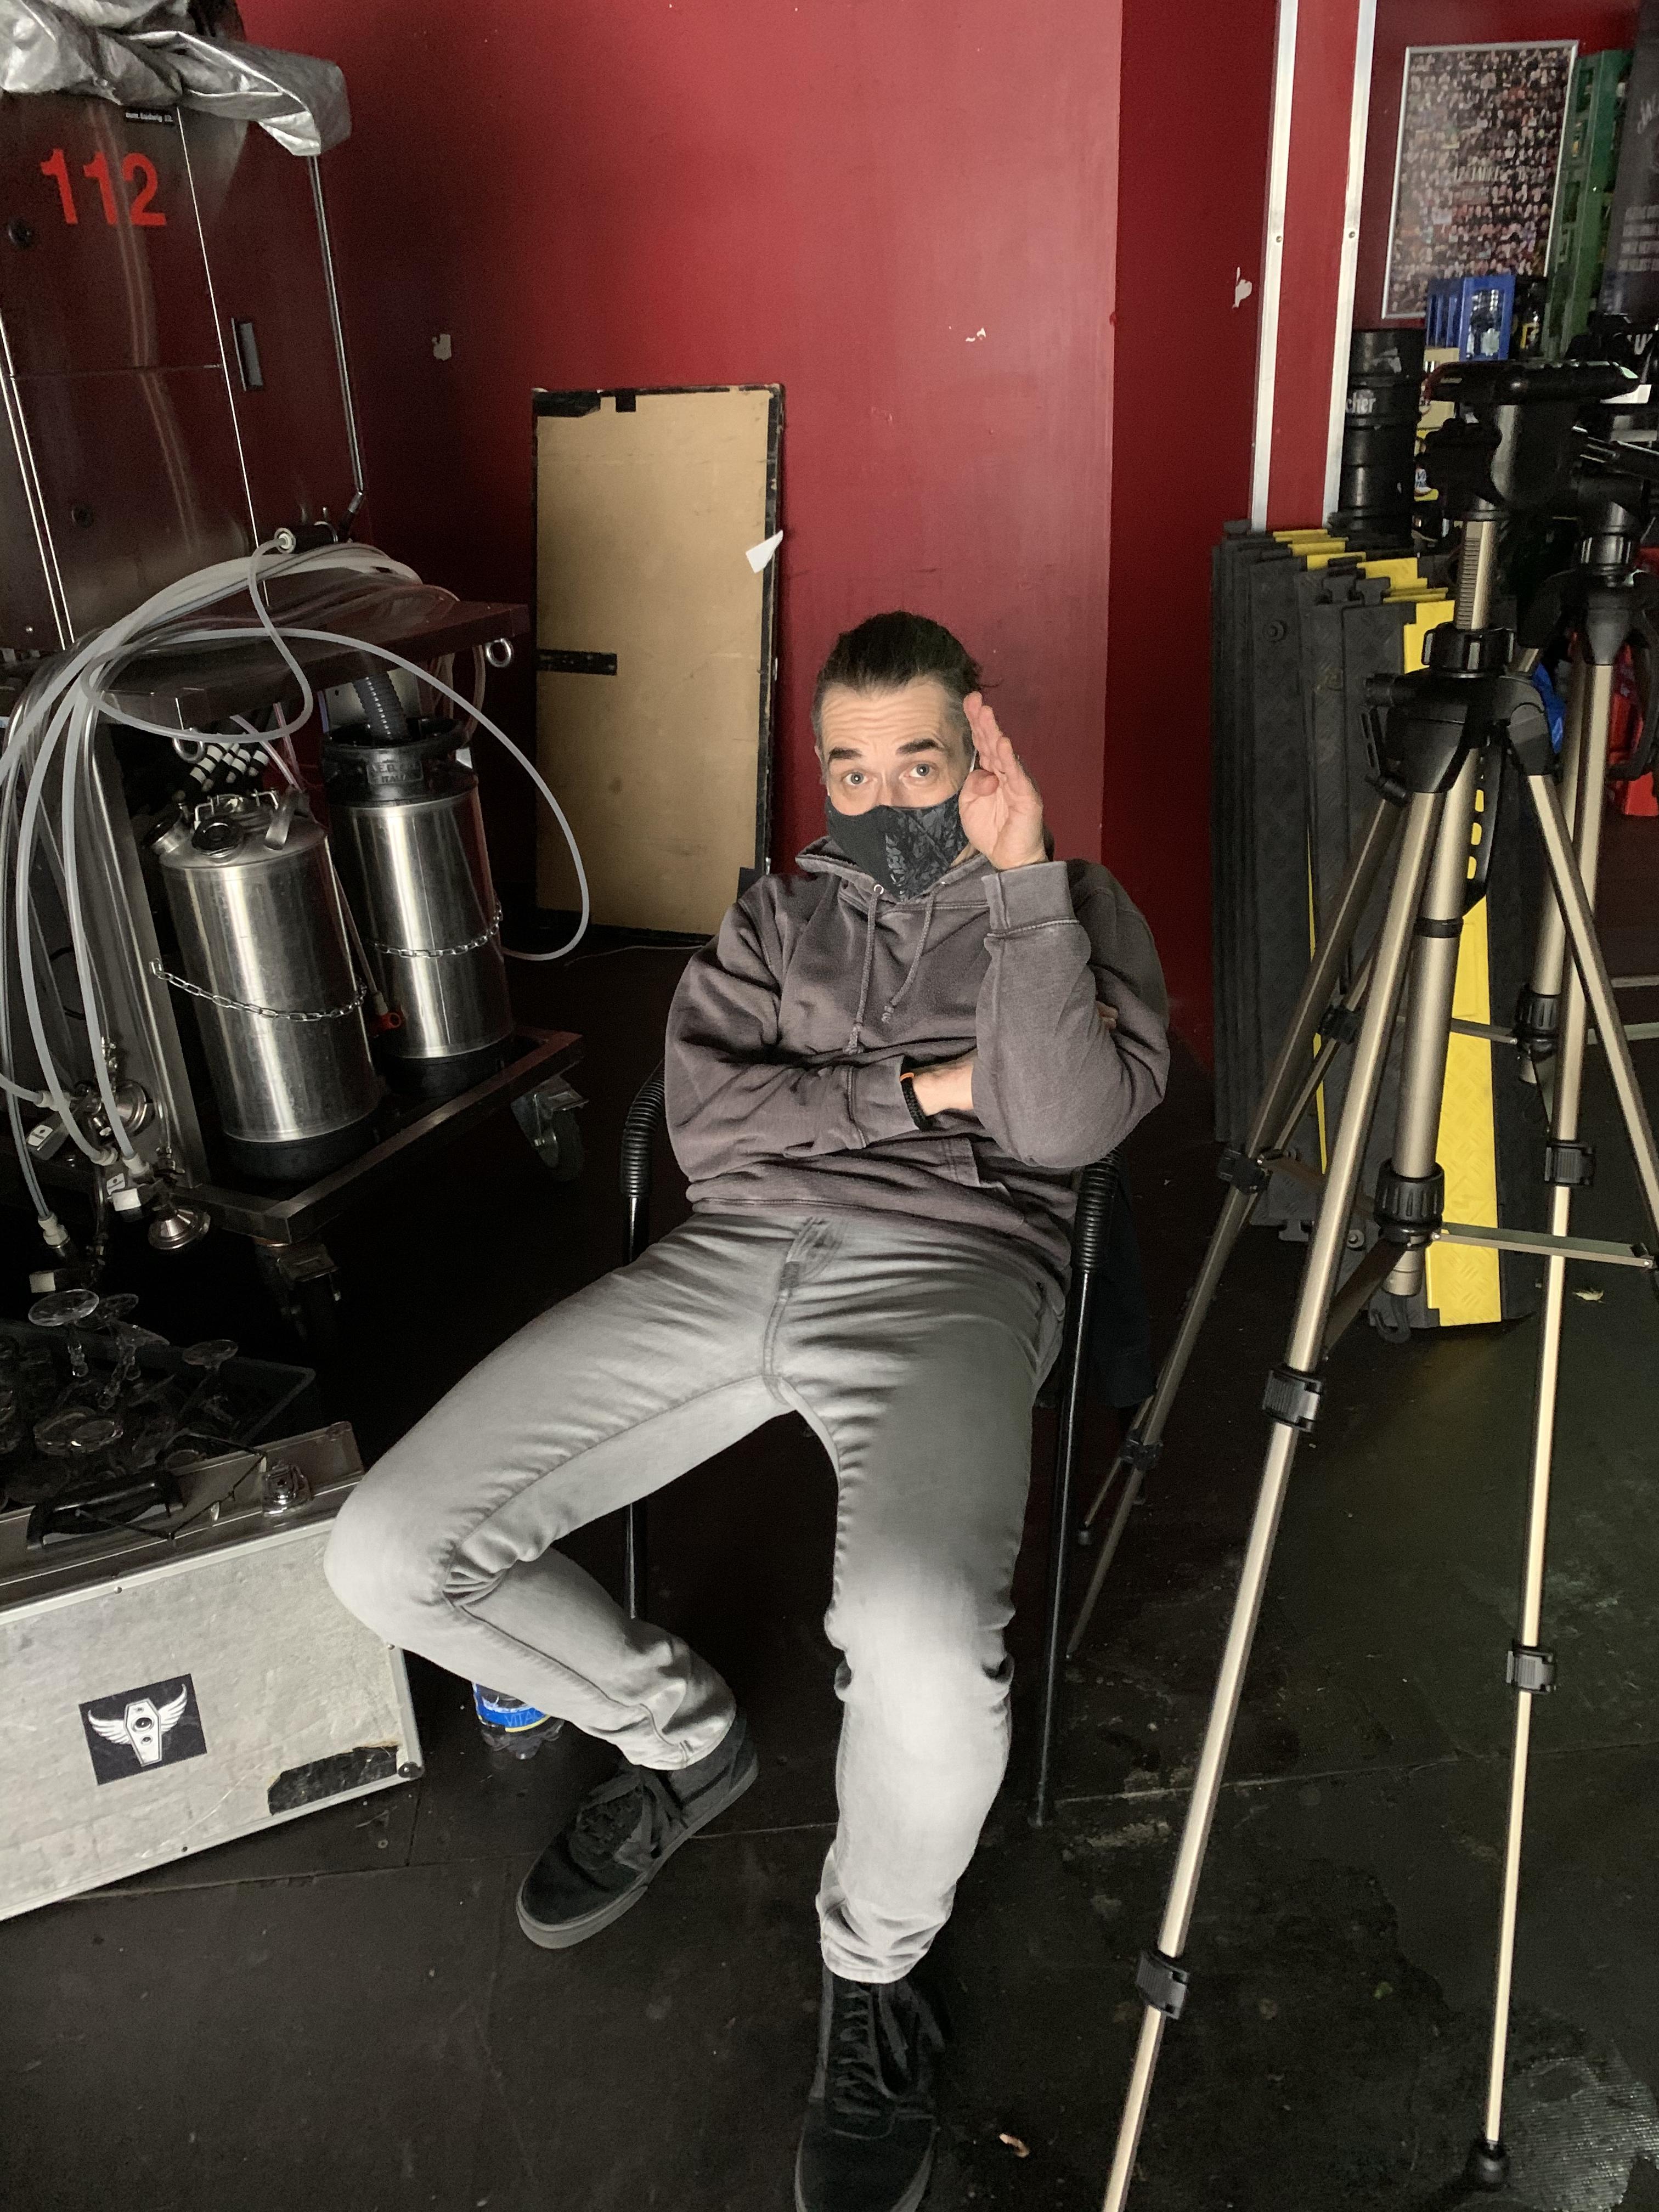 The-Very-End-Metal-Video-Shoot-behind-the-scenes_5443